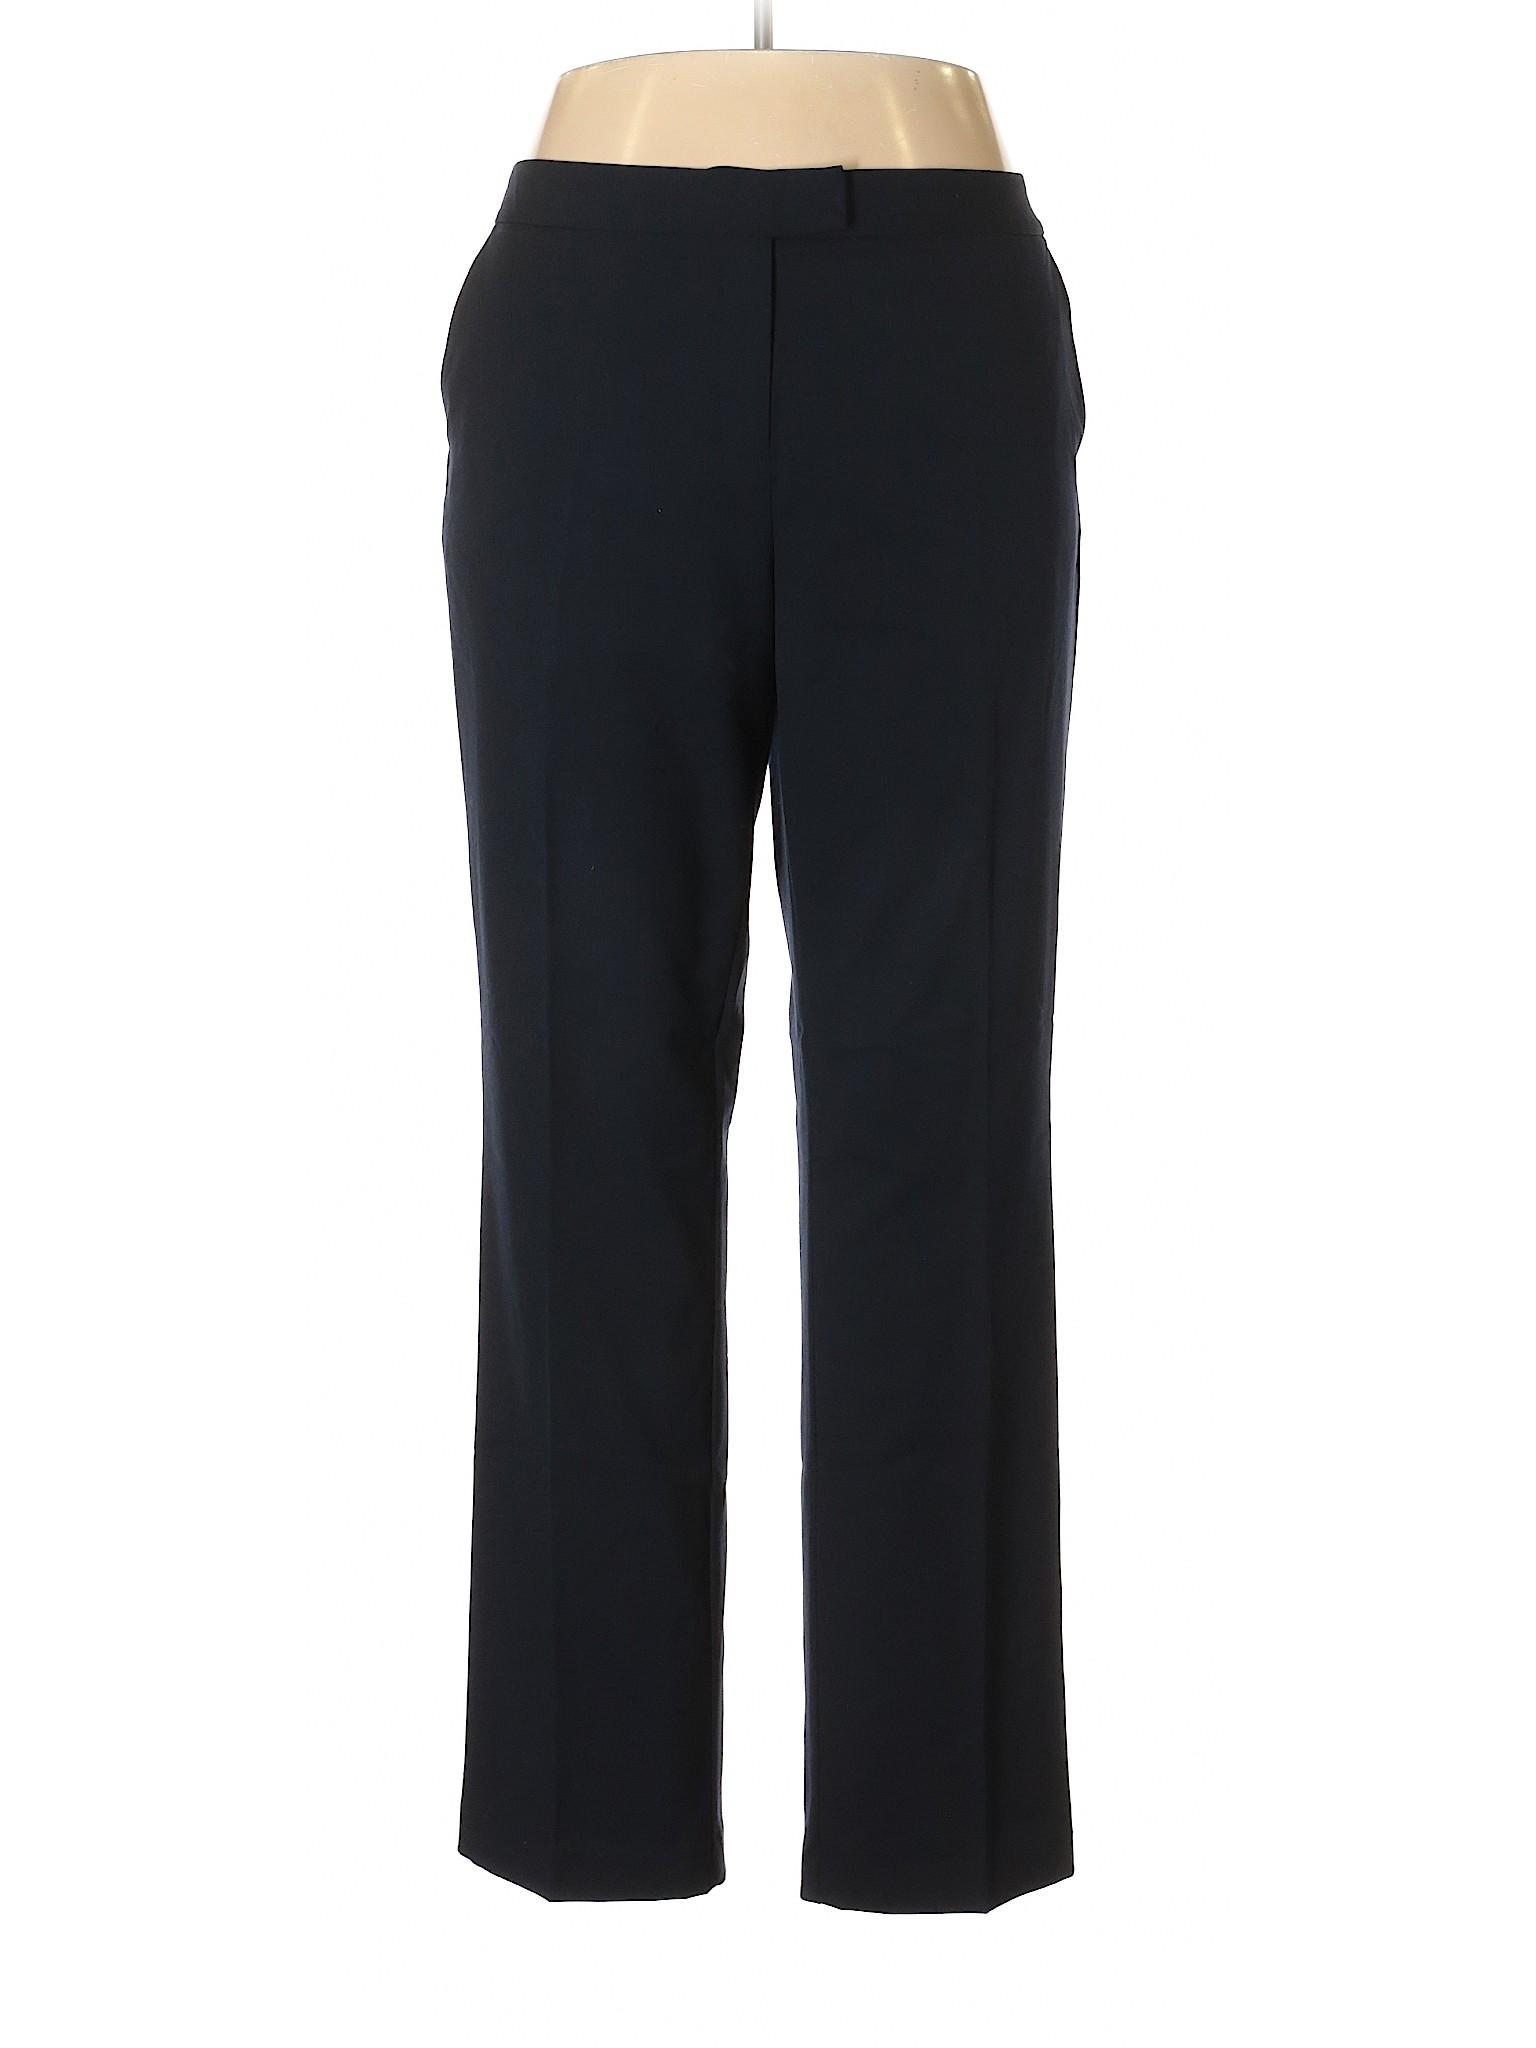 Dress York Pants Jones leisure New Boutique WInaPqx